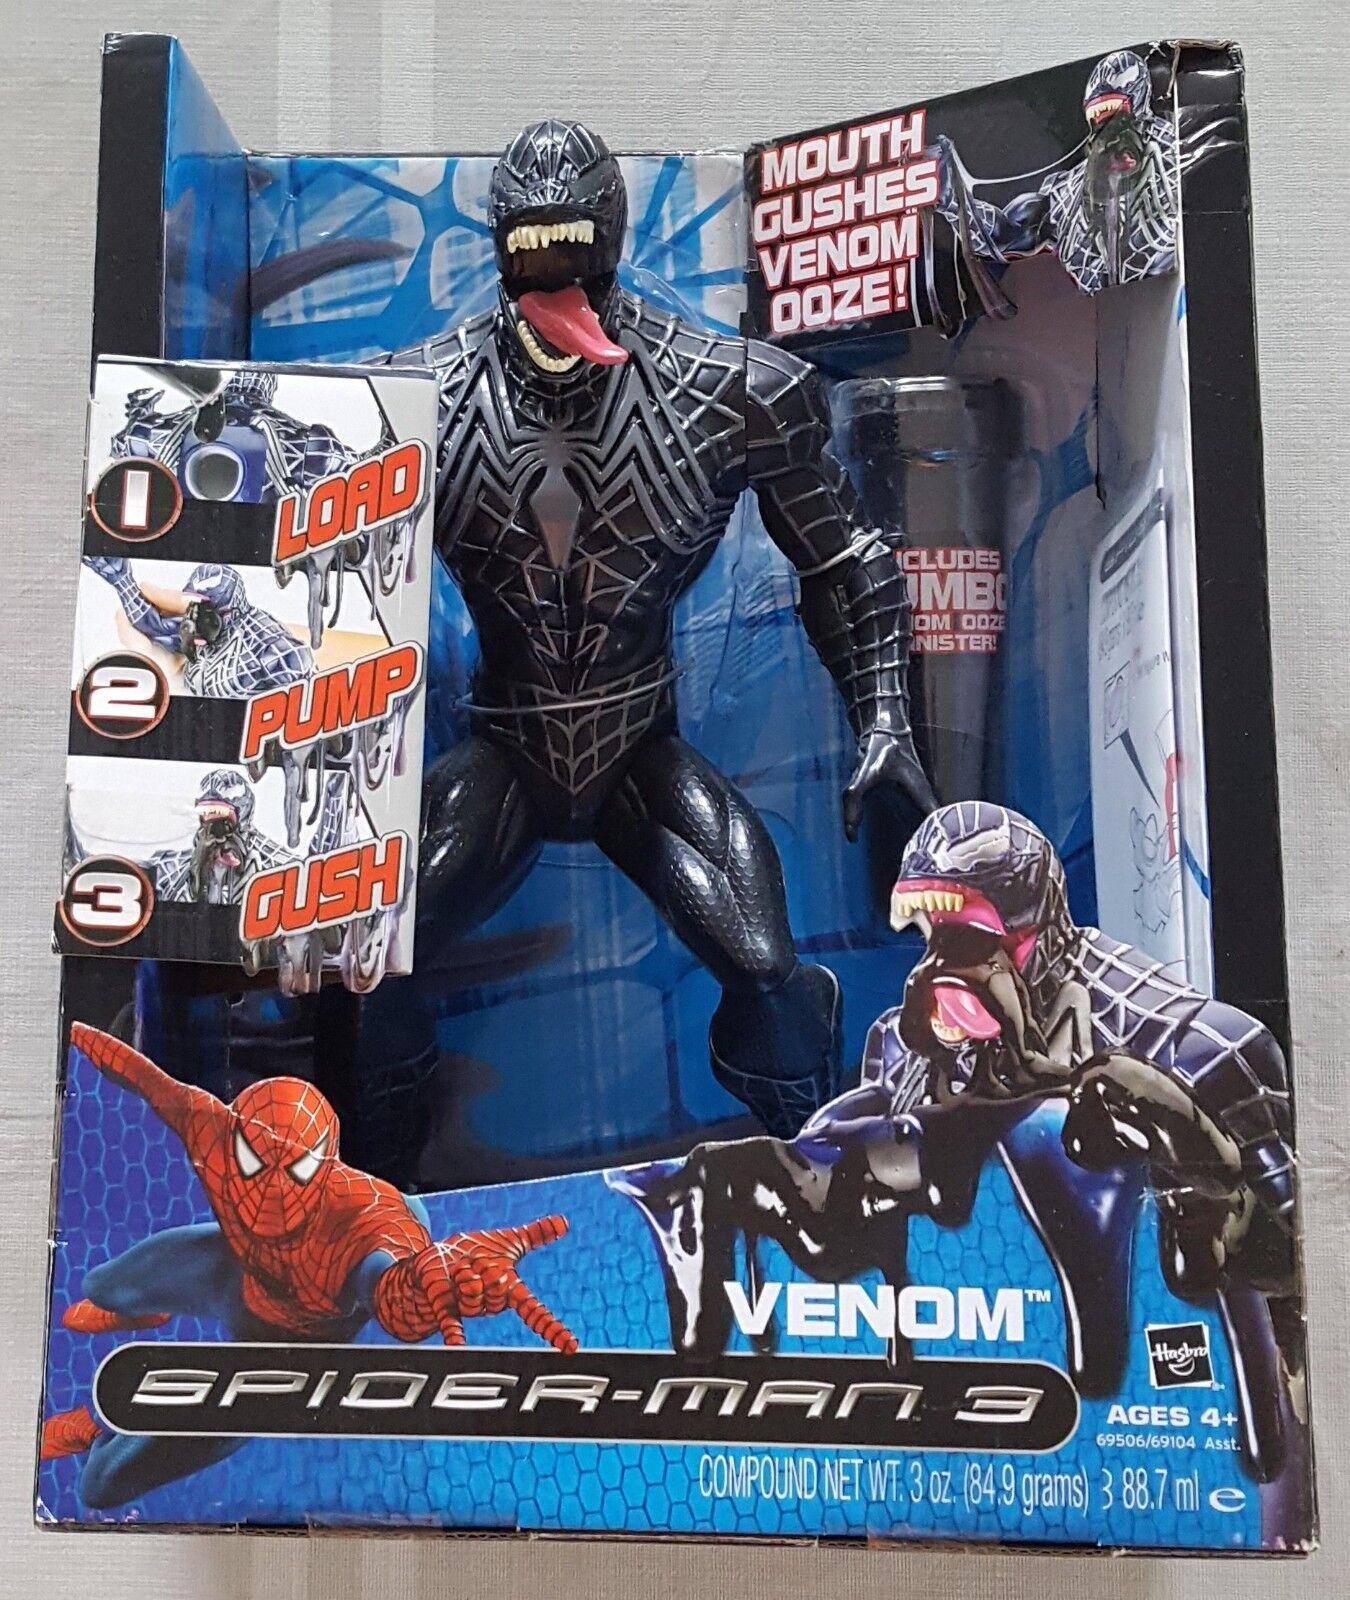 Spider-man 3 Venom 12  Action Figure - Hasbro - Great Condition